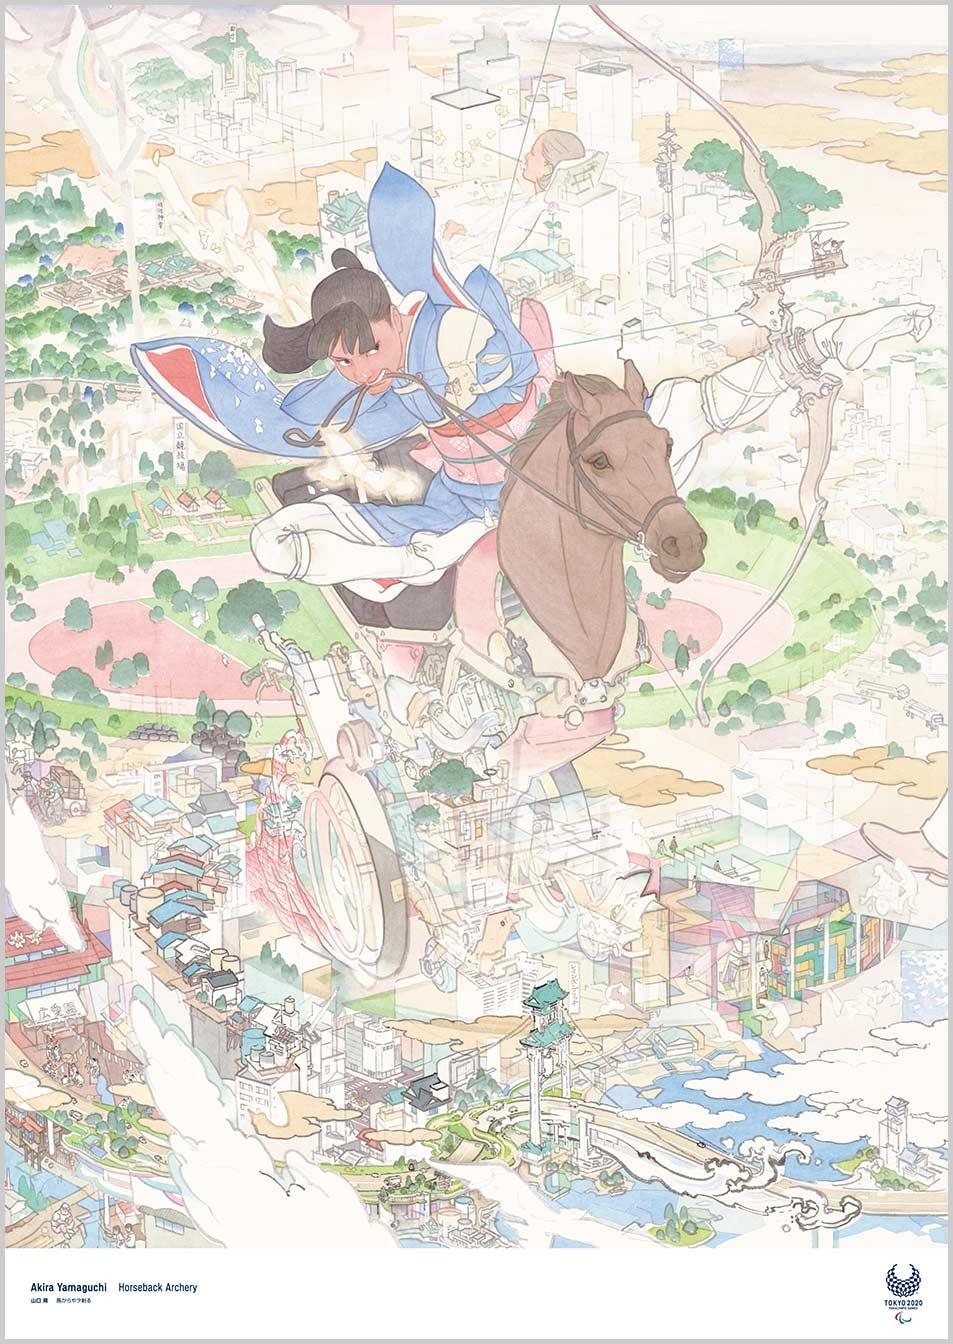 Akira Yamaguchi (Pintor) Cartazes oficiais para os Jogos Olímpicos Tóquio 2020